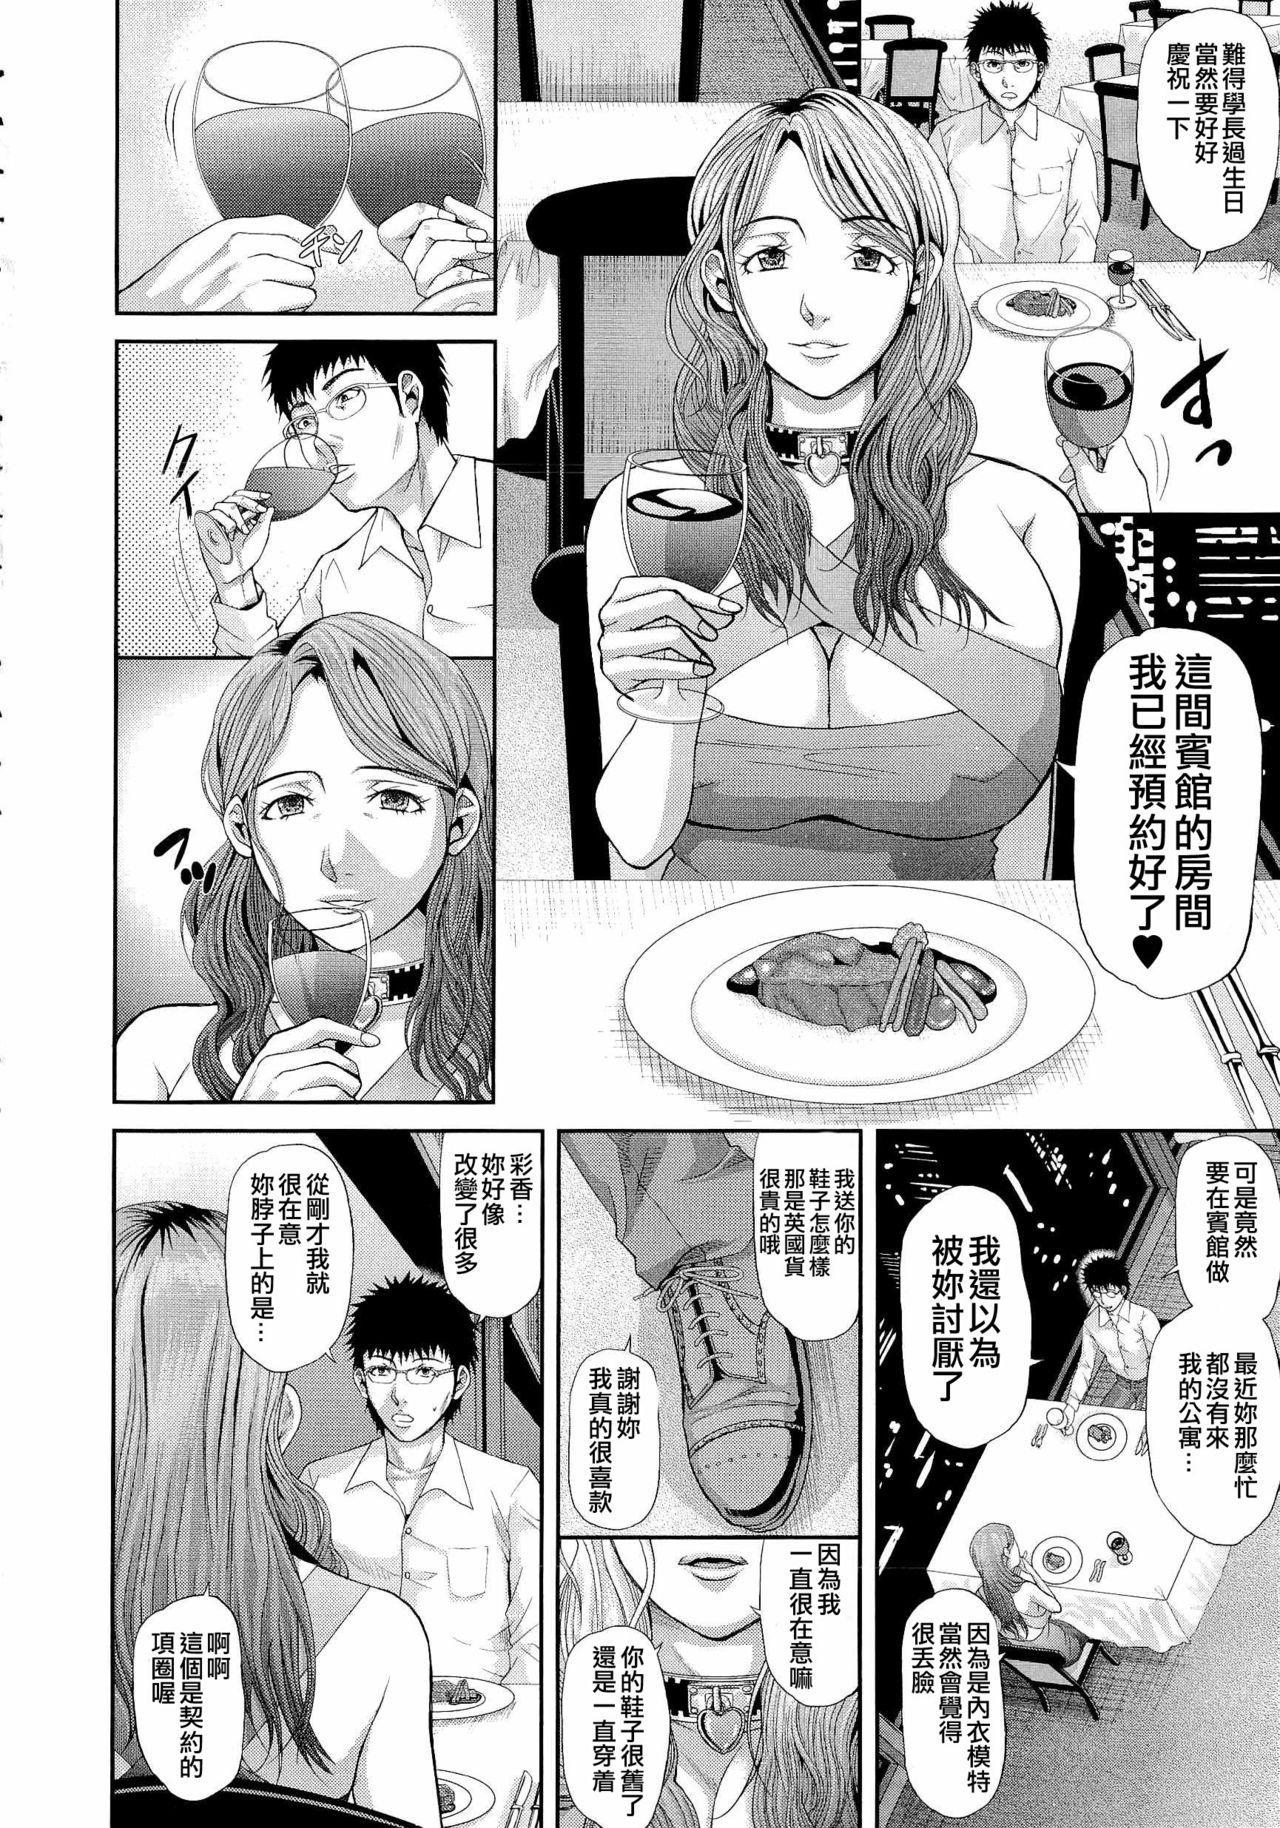 [Honebuto Danshaku] Innou Kaizou Program ~Oyako Zecchou Cult Ochi~ [Chinese]【不想记名重嵌--高质量图源】 124